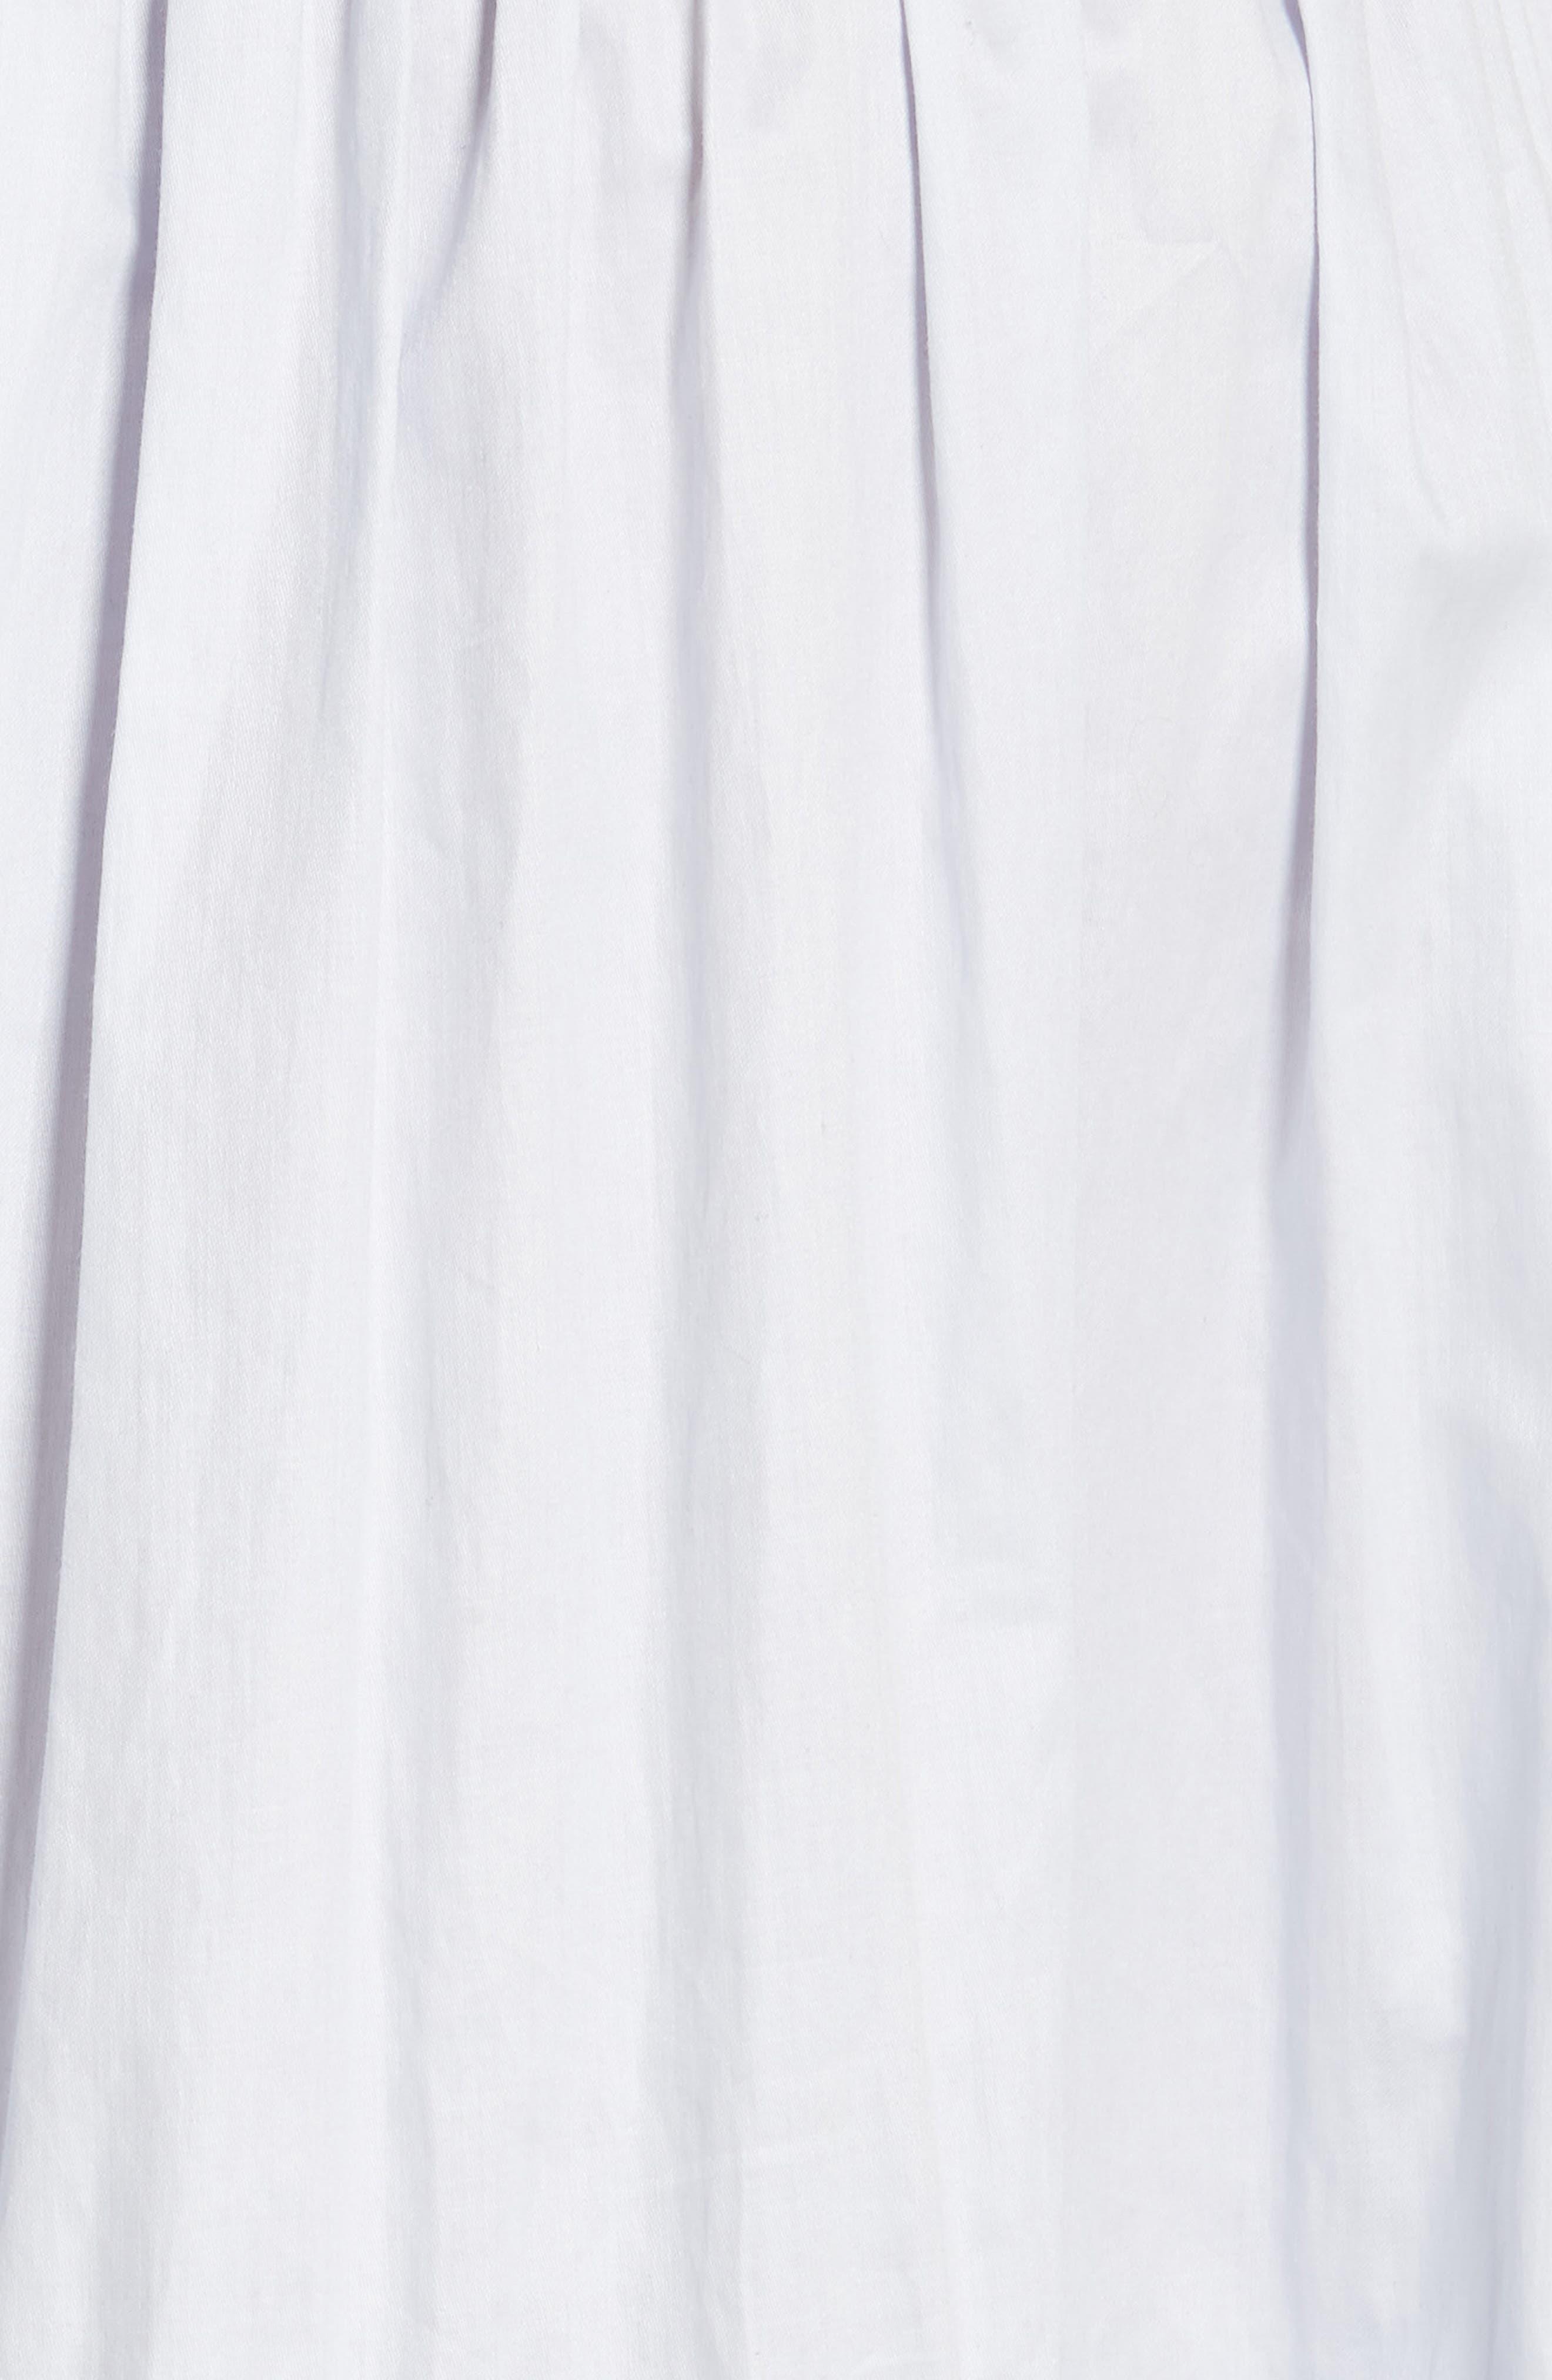 REBECCA TAYLOR, Smocked Sleeveless Cotton Top, Alternate thumbnail 5, color, 458